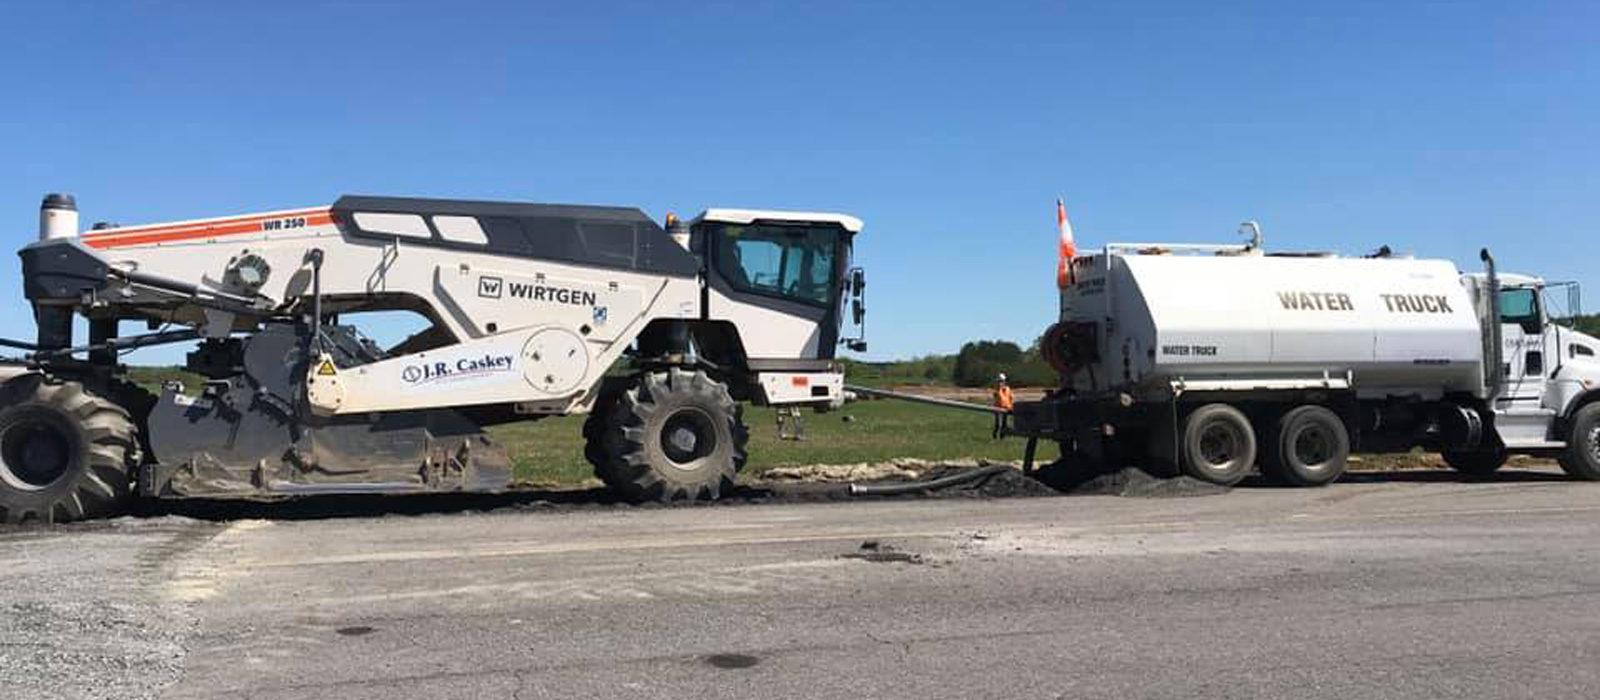 J.R Caskey Heavy Equipment Truck